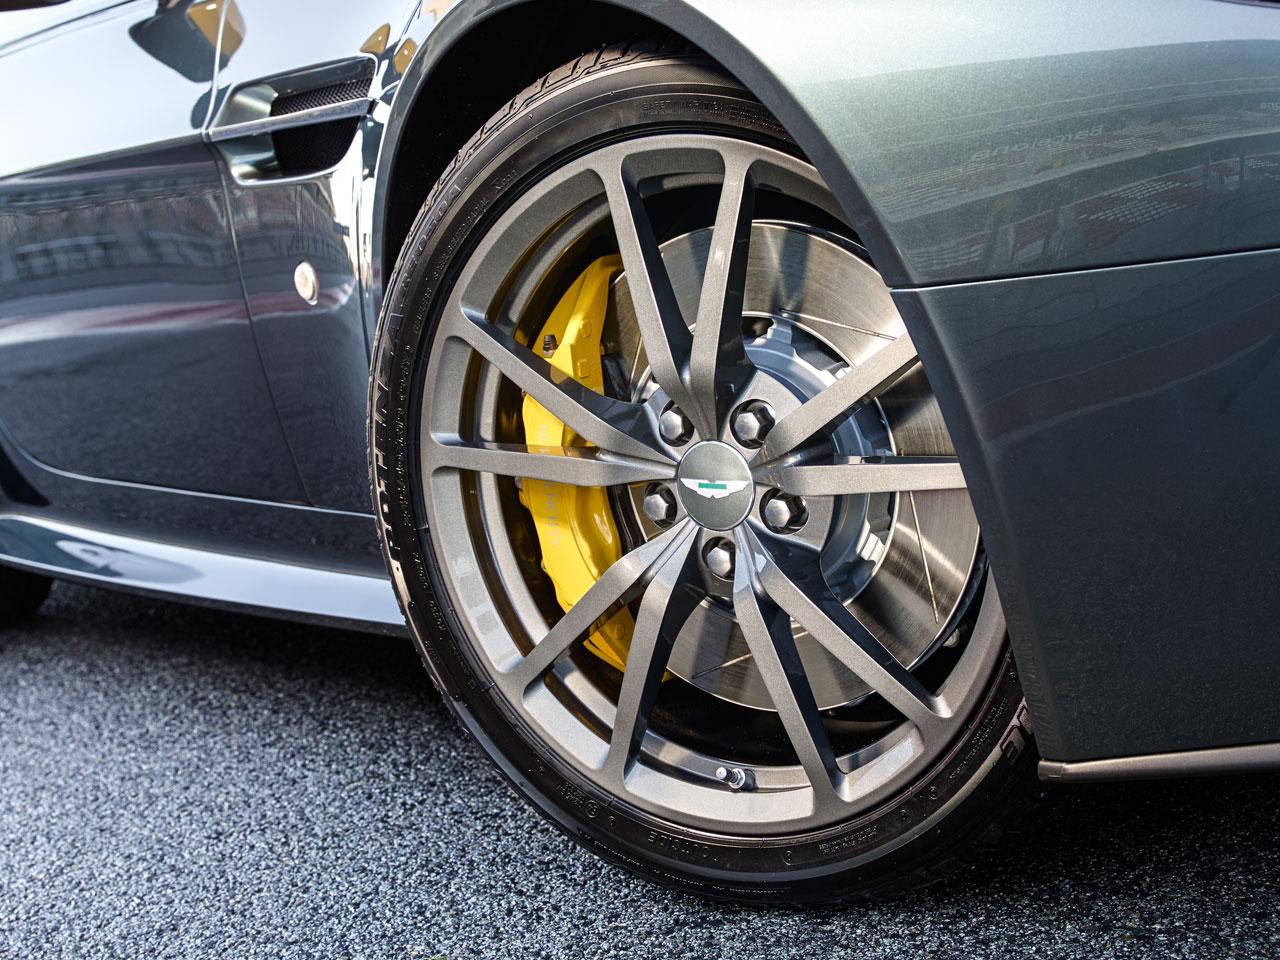 Aston Martin V8 Vantage N430 rims